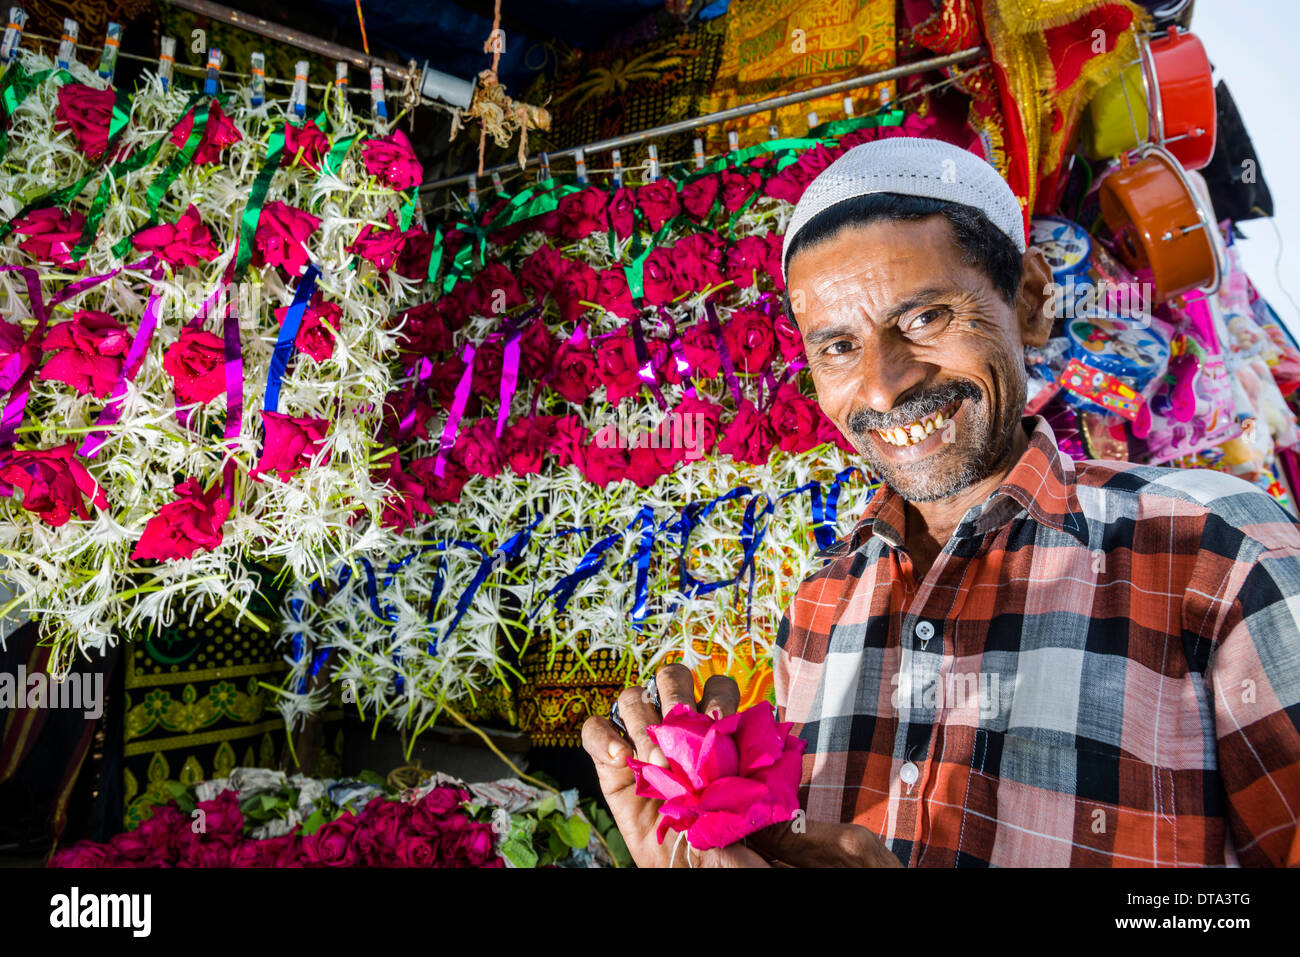 A Muslim salesman is selling flowers, Mahalaksmi, Mumbai, Maharashtra, India - Stock Image